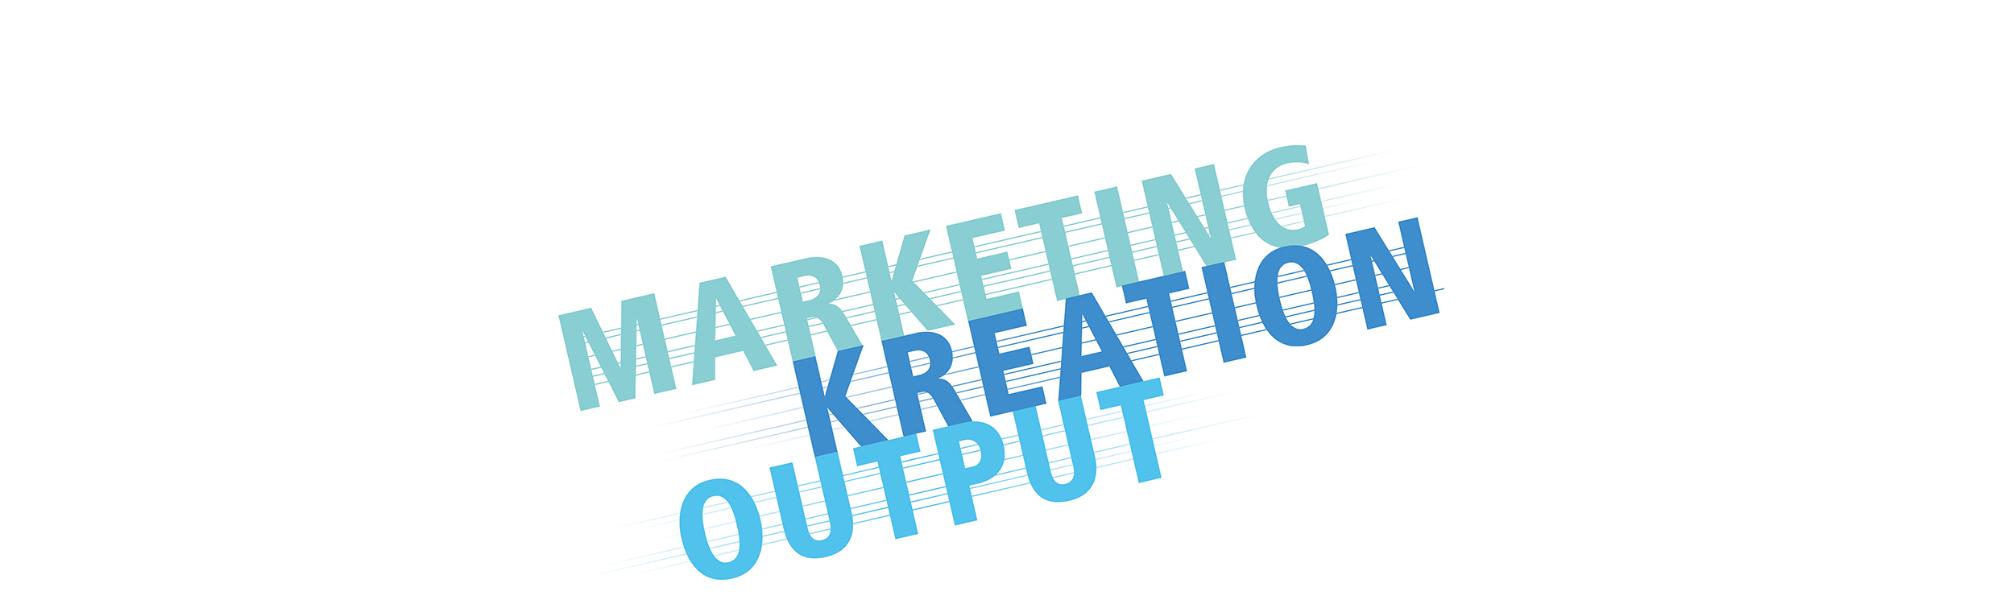 Slider 4 Marketing_Kreation_Output